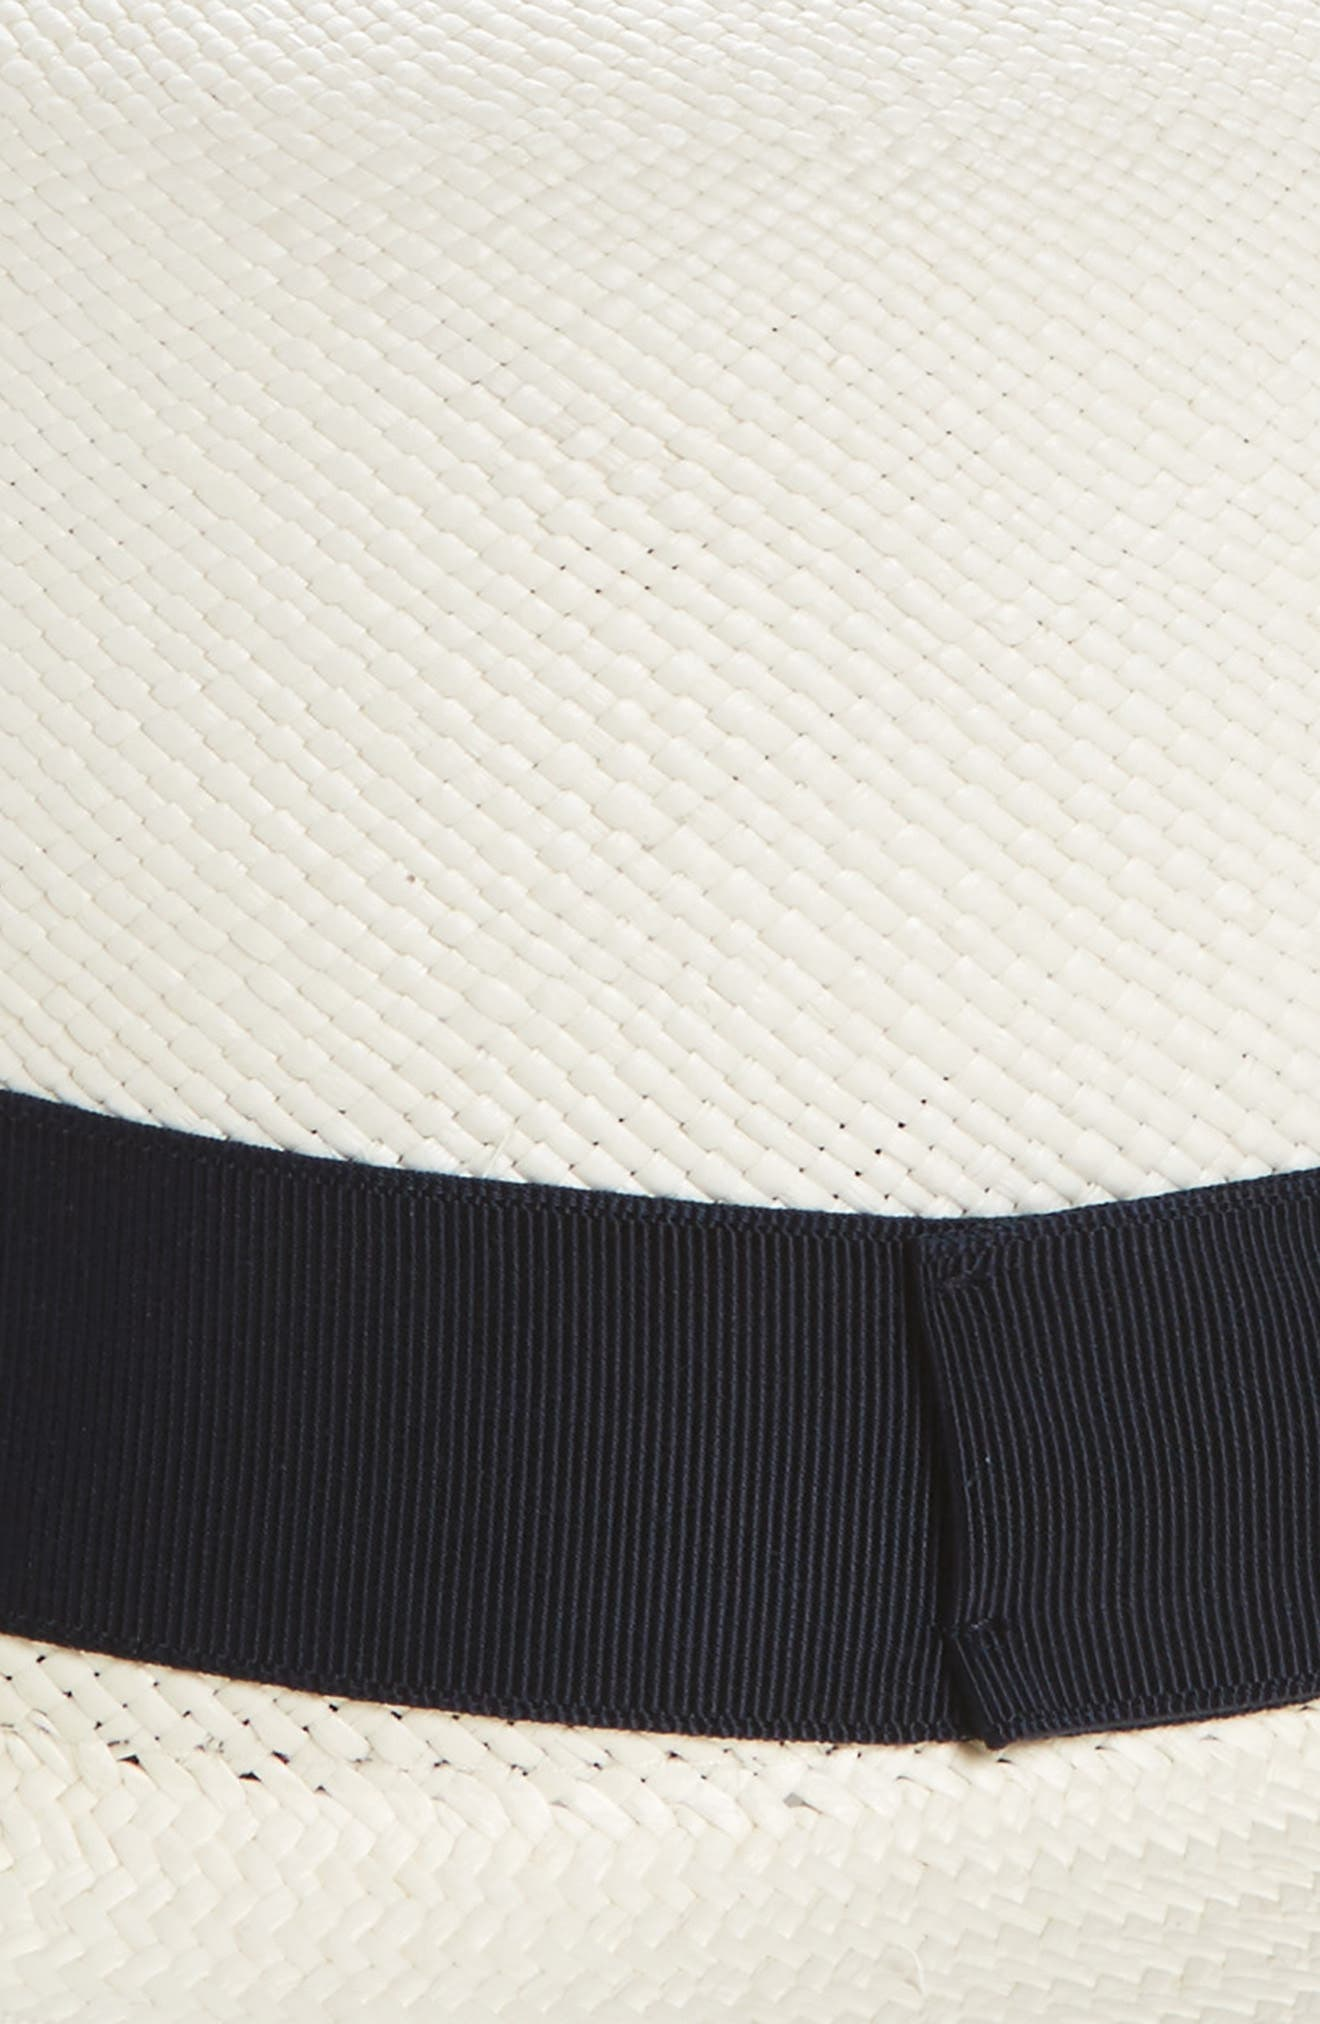 Alternate Image 2  - Christy's Hats Folder Straw Panama Hat